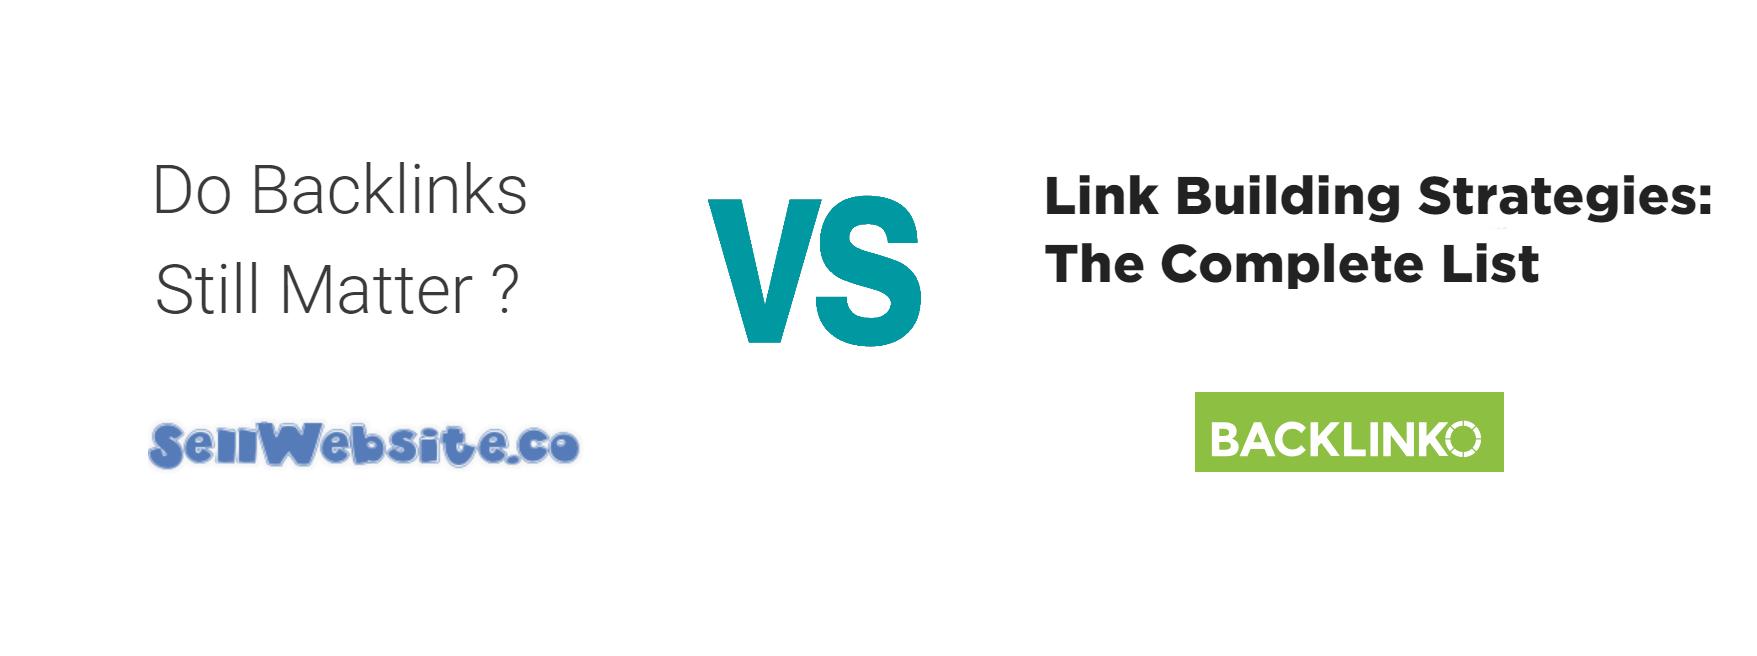 """ Do Backlinks Still Matter? "" (SellWebsite.co) vs. "" Link Building Strategies: The Complete List "" (Backlinko)"